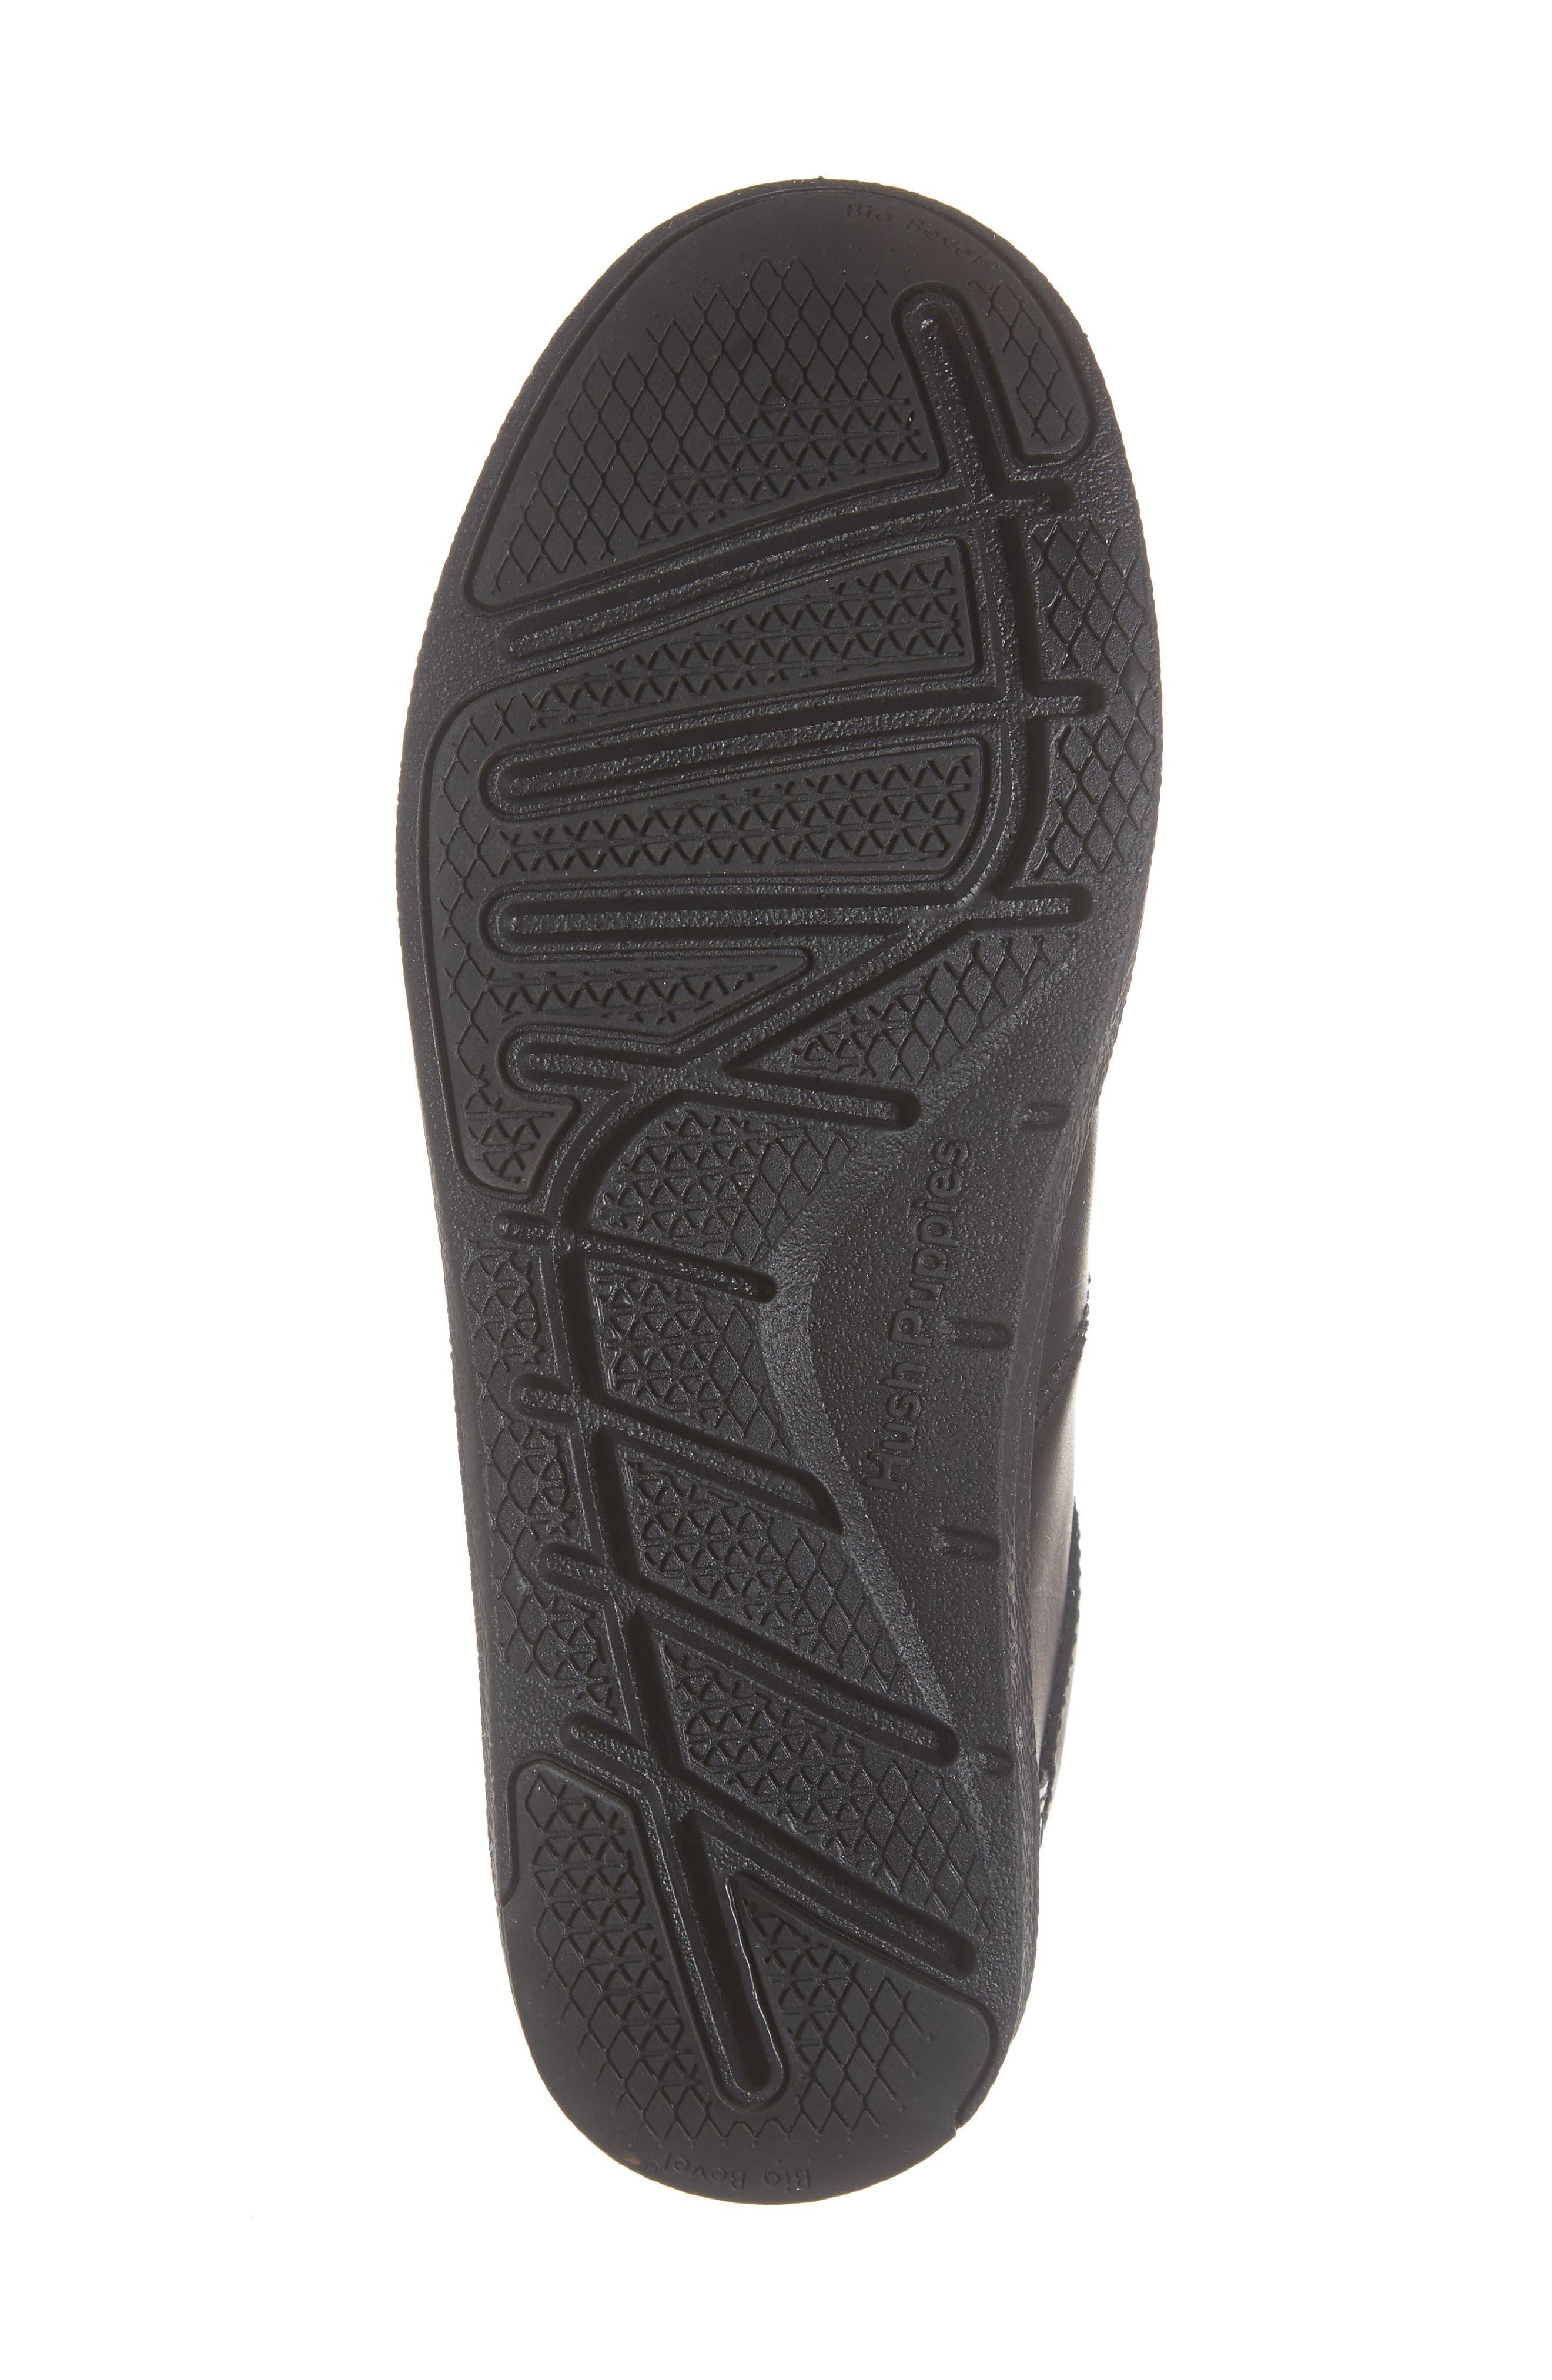 Layden Genius Leather Sneaker,                             Alternate thumbnail 6, color,                             BLACK/ BLACK